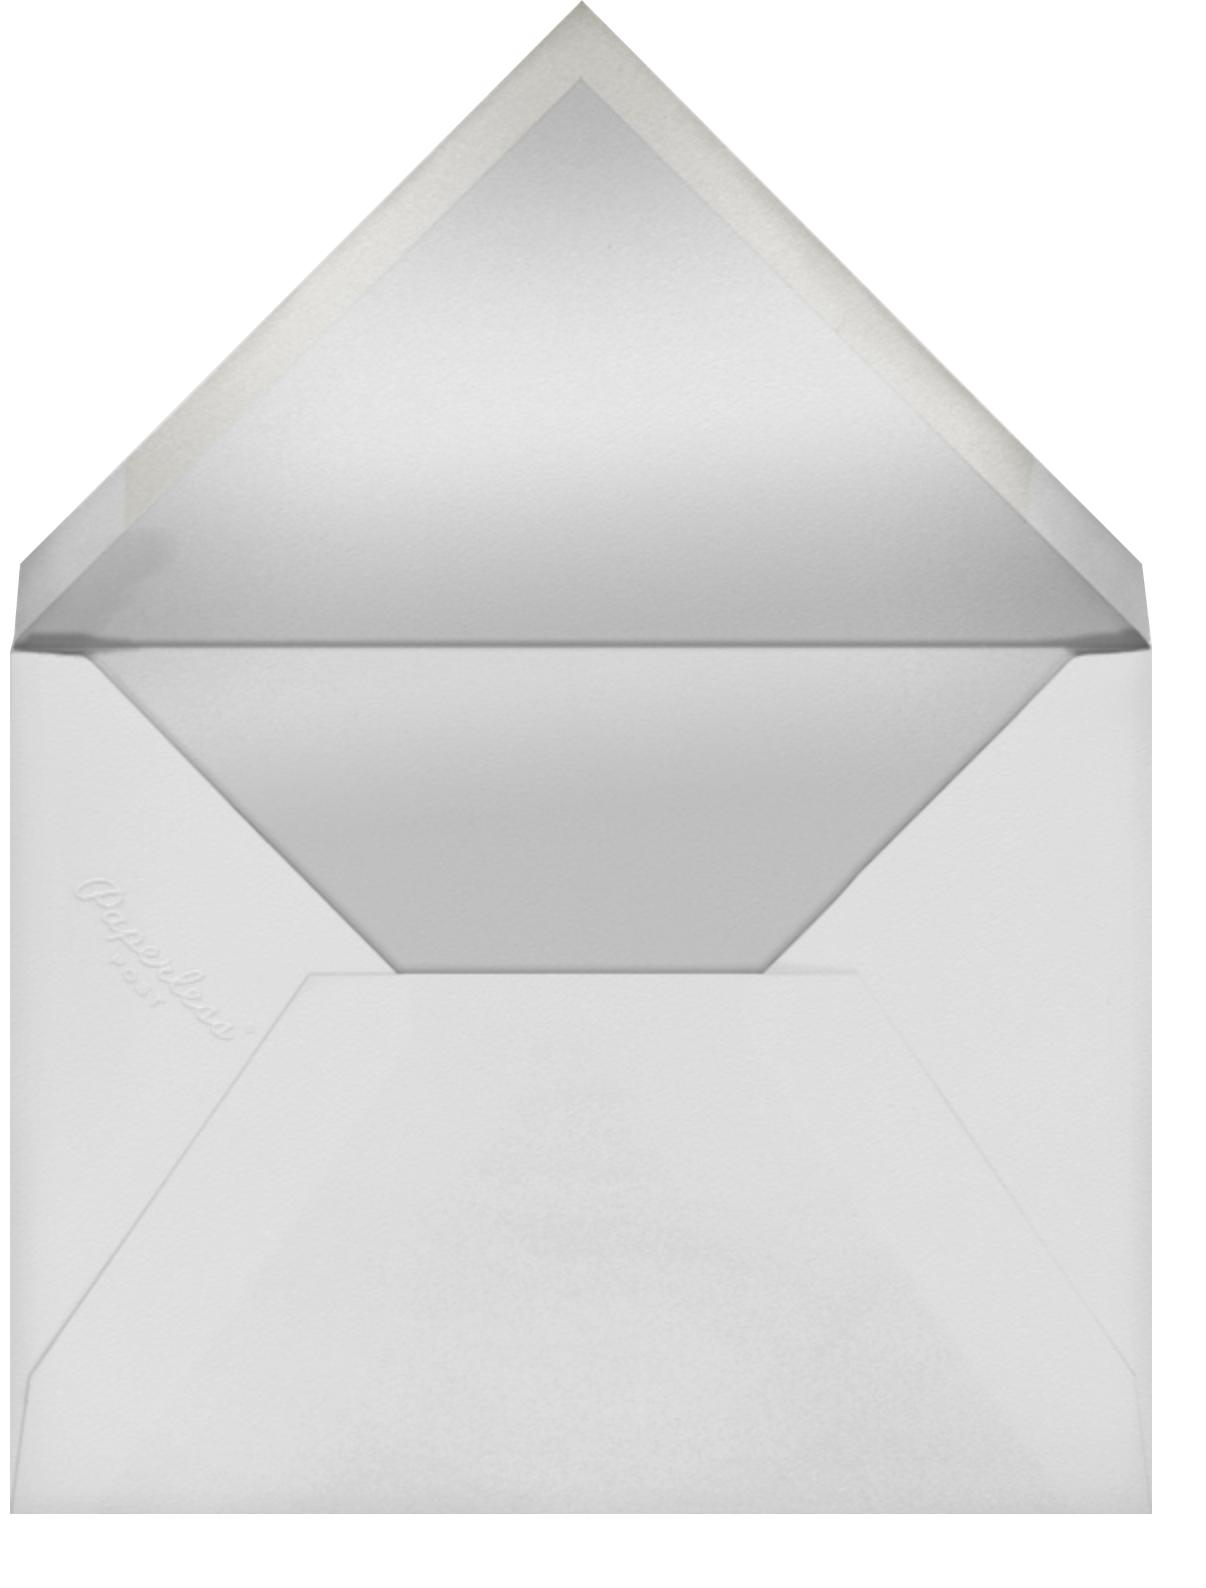 Toronto Skyline View (Menu) - White/Black - Paperless Post - Menus - envelope back